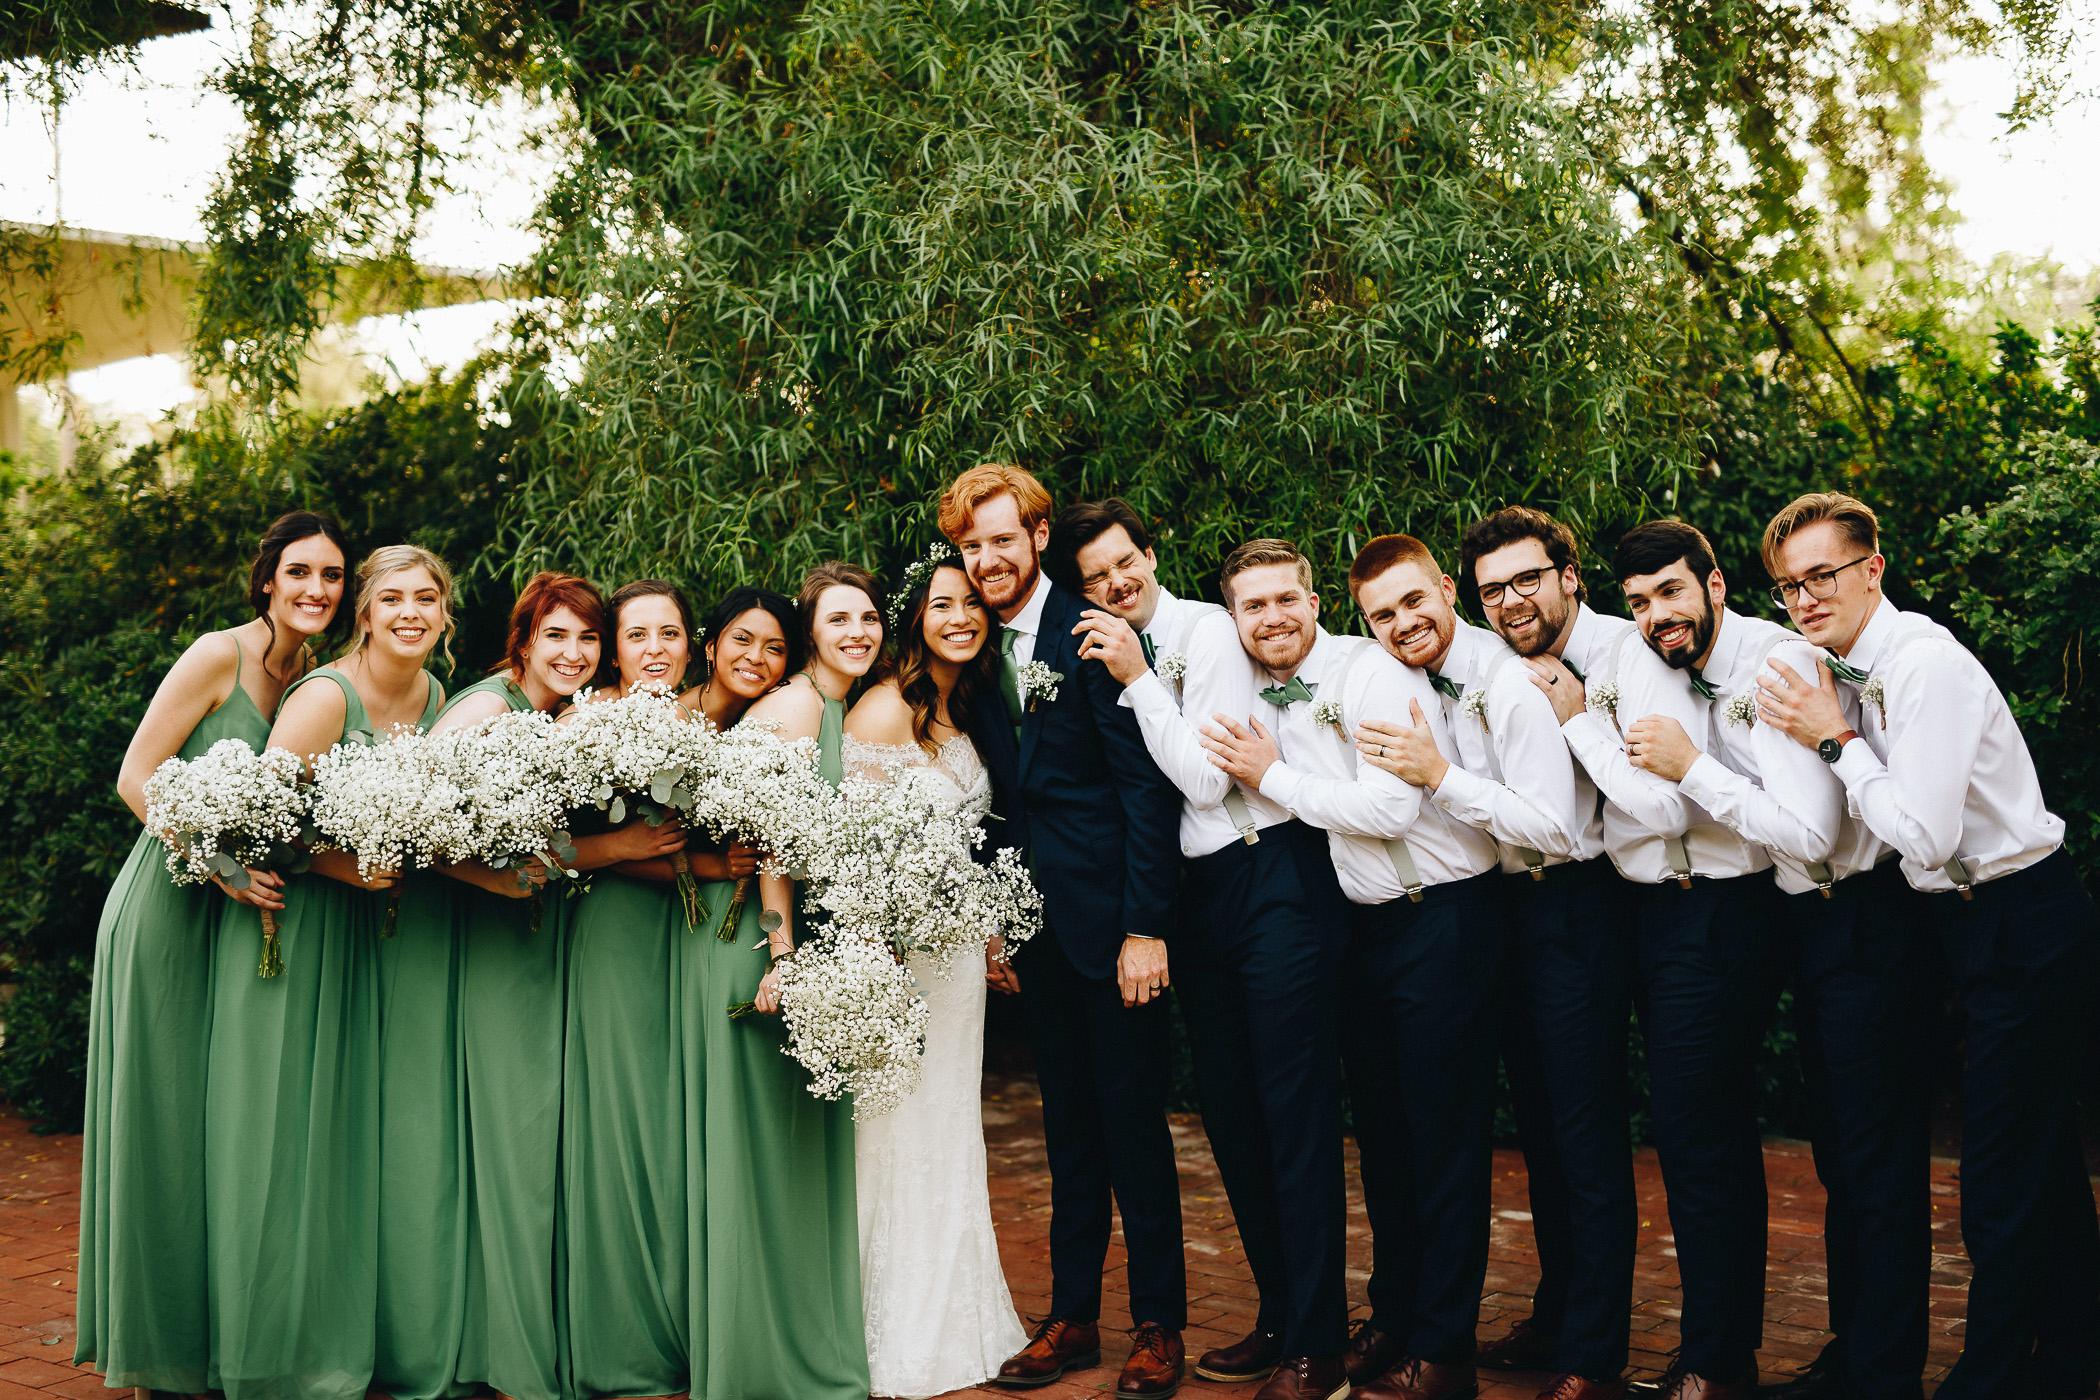 181104-Luxium-Weddings-Arizona-@matt__Le-Brandon-Kariana-Phoenix-Valley-Garden-Center-1091.jpg